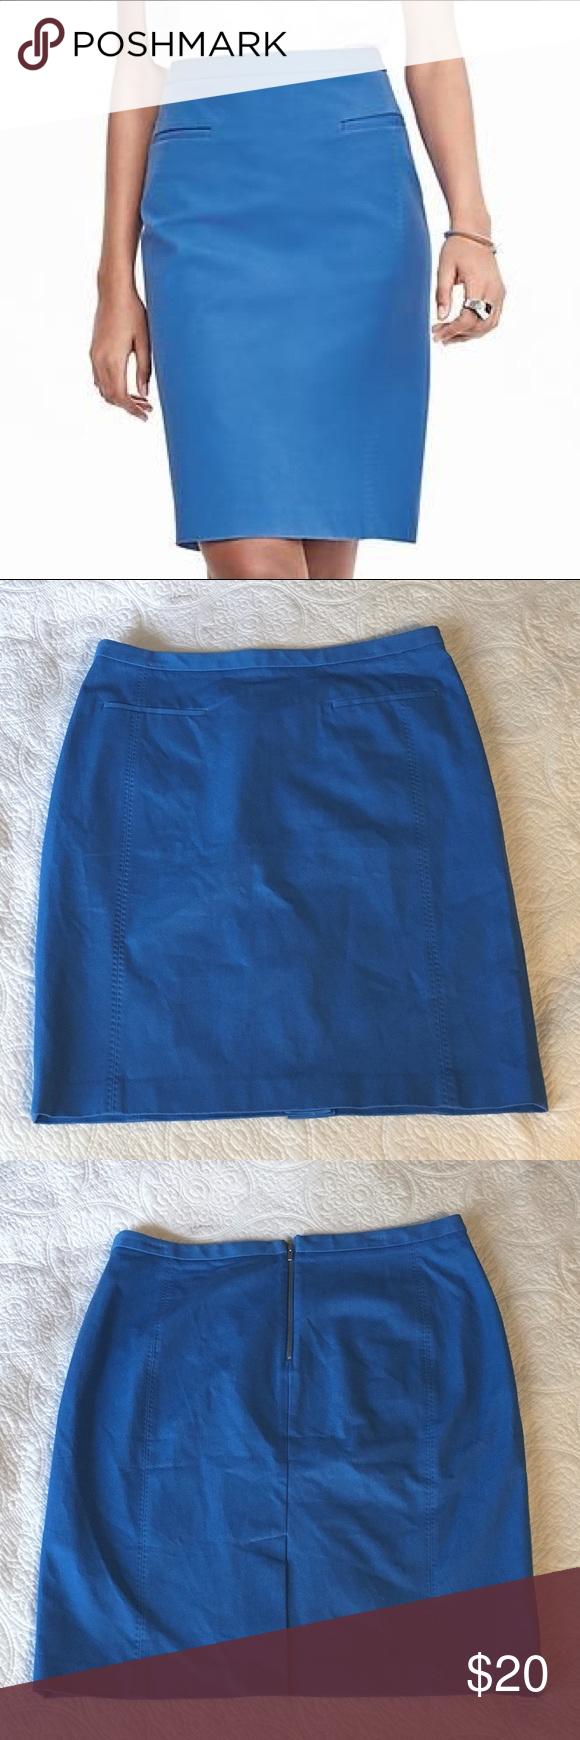 Banana Republic Skirt NWOT! Great skirt, just never got around to wearing it! Banana Republic Skirts Pencil